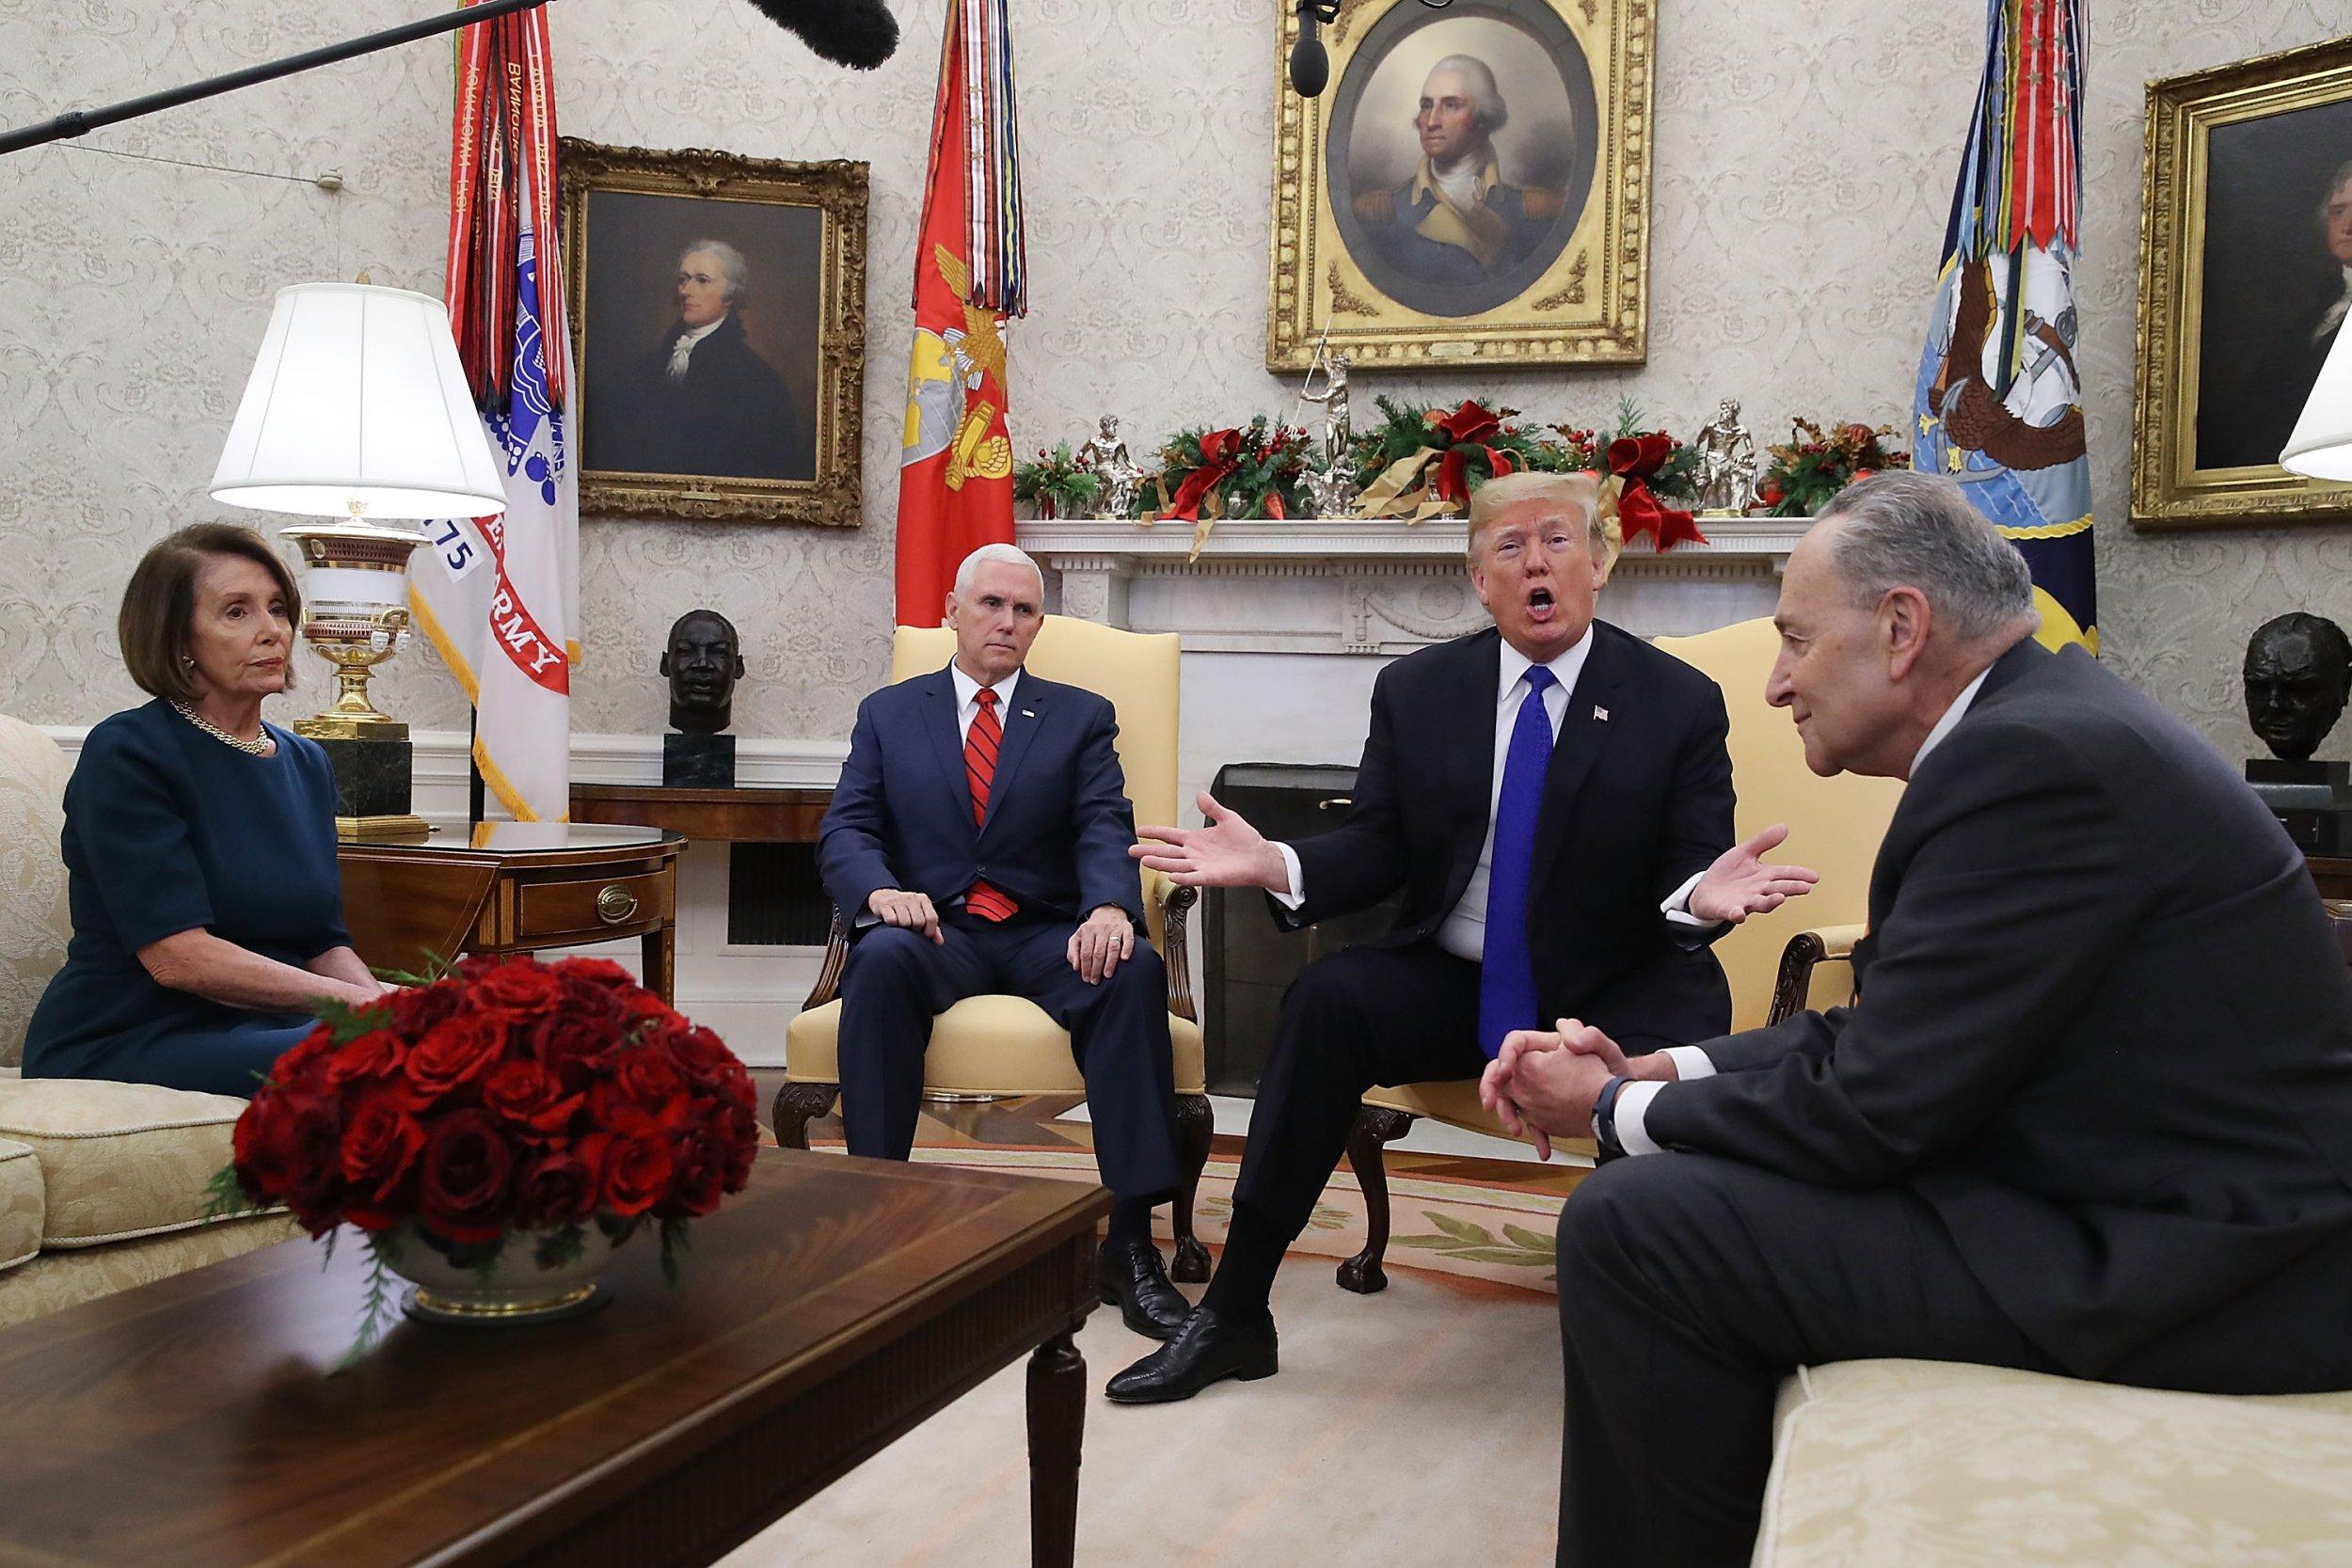 Alexandria Ocasio-Cortez, Donald Trump, Nancy Pelosi, Chuck Schumer, Mike Pence